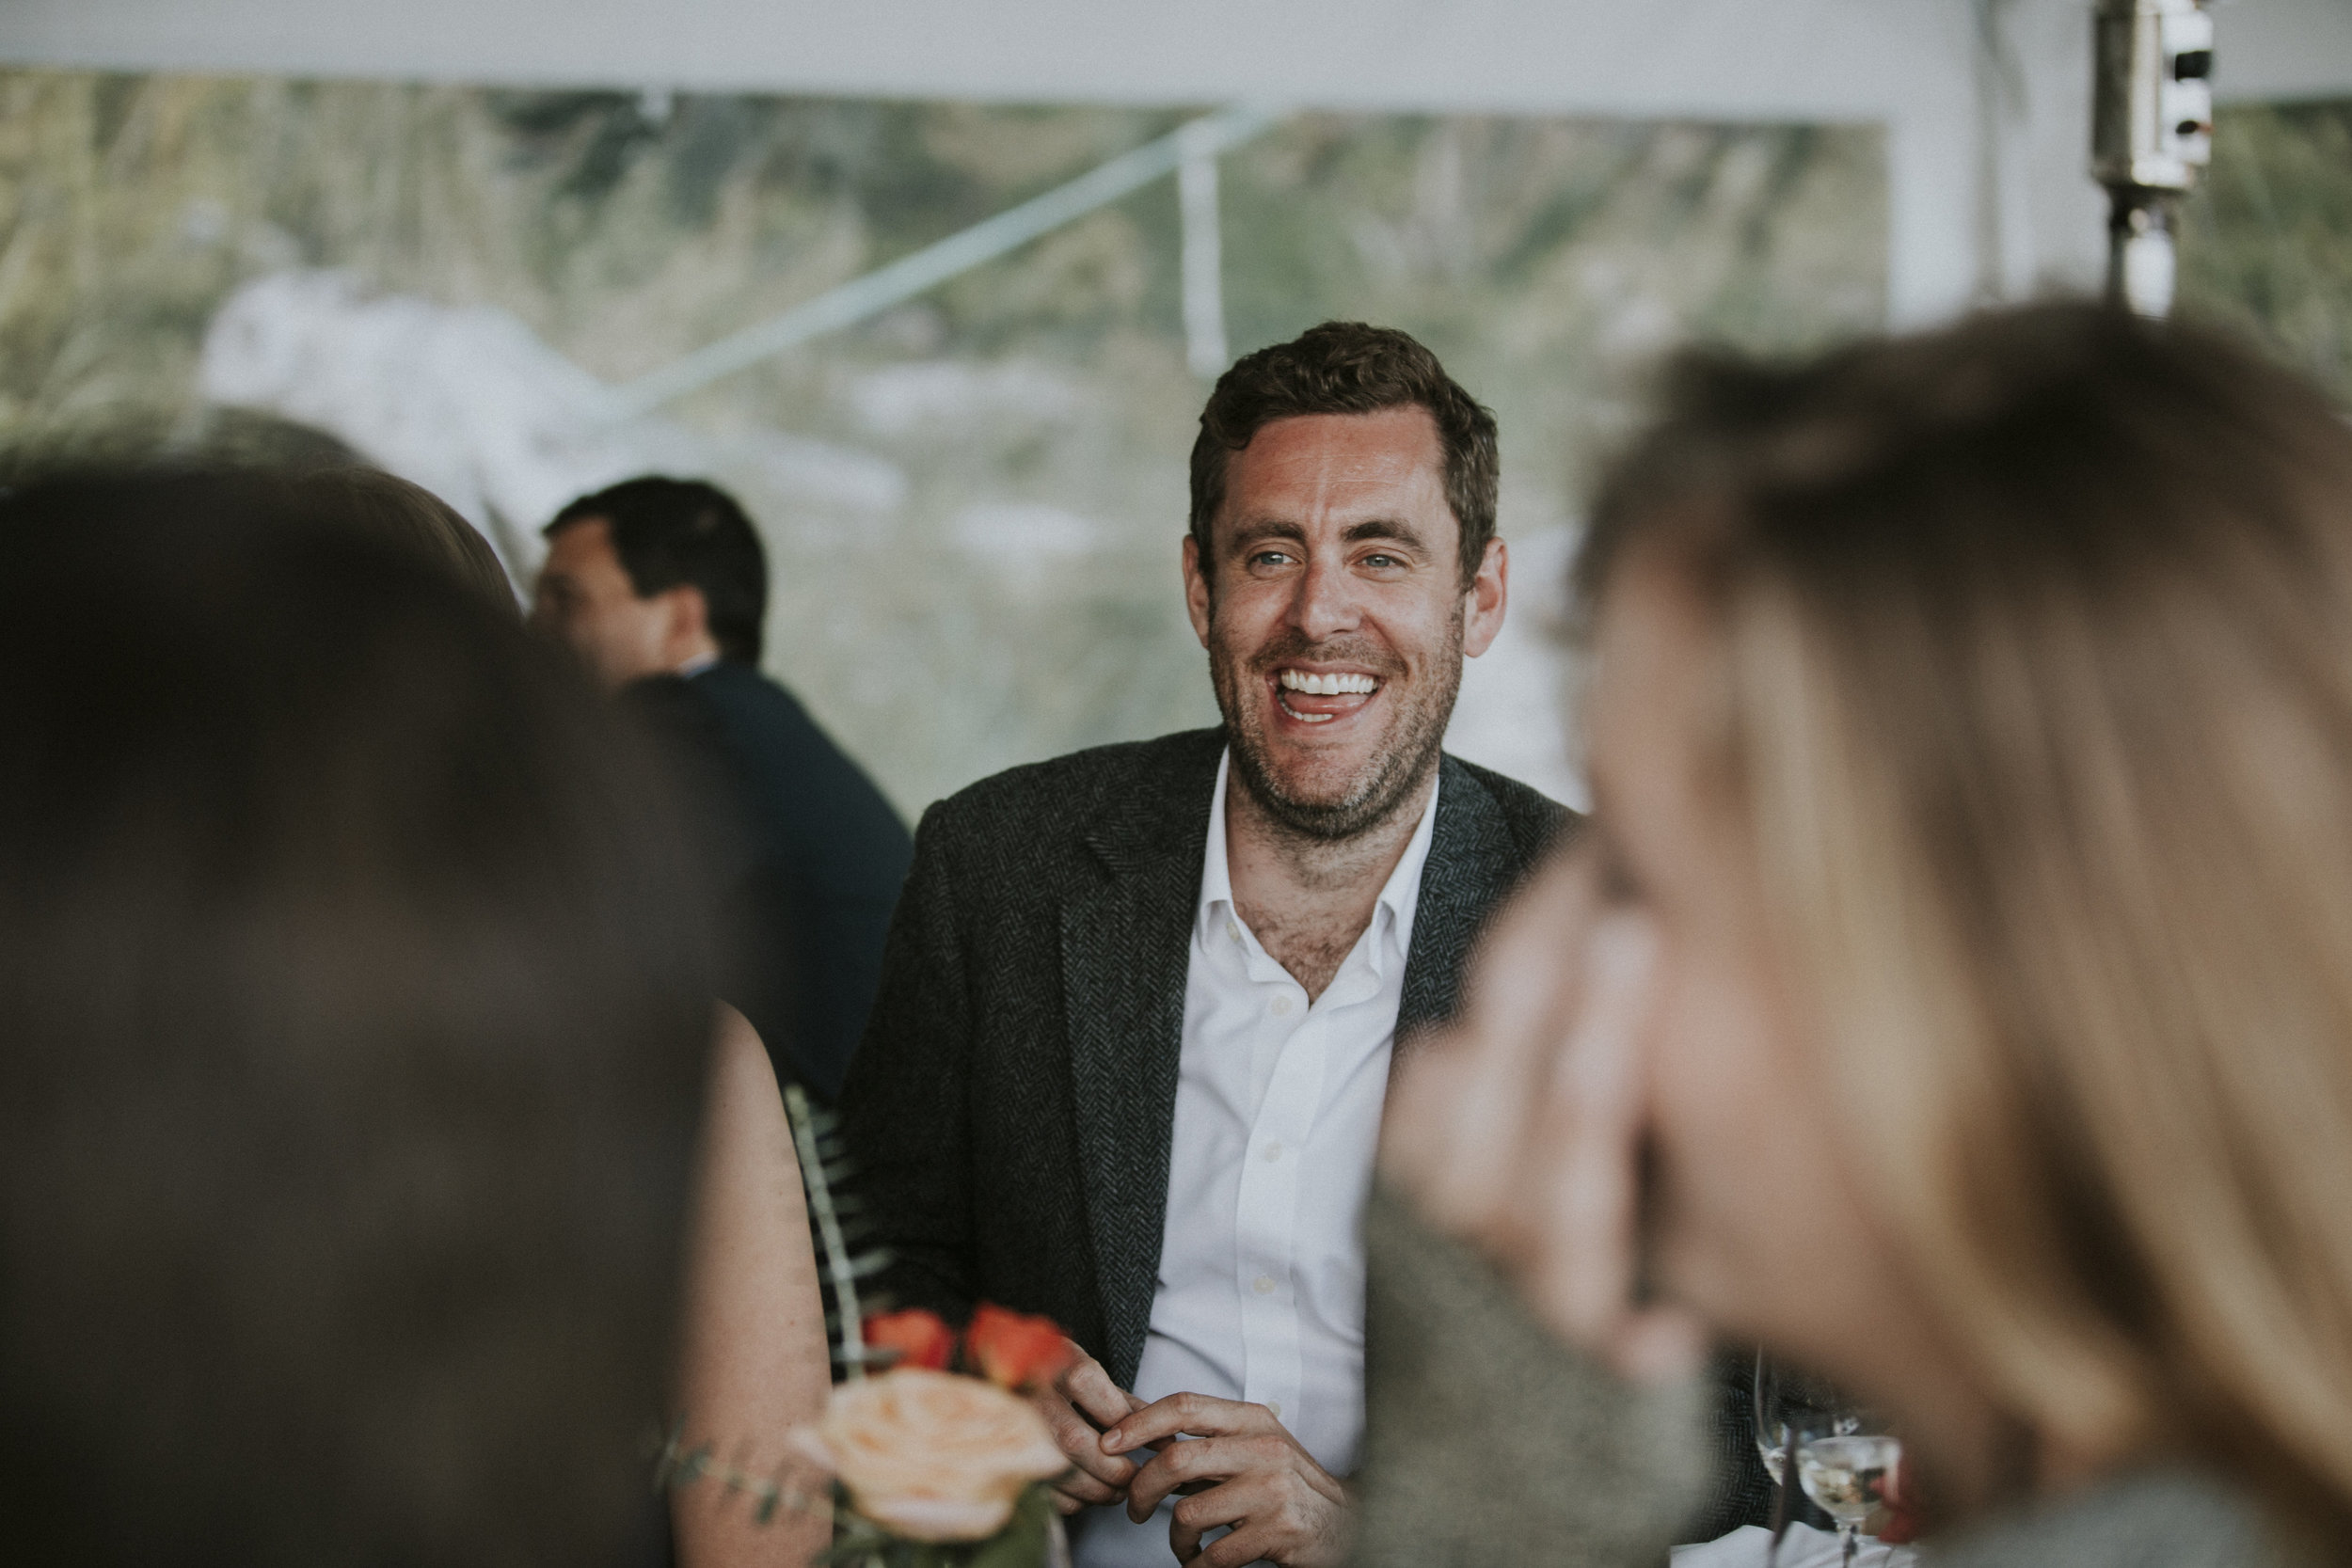 wedding guests laughing at reception wickaninnish inn beach wedding